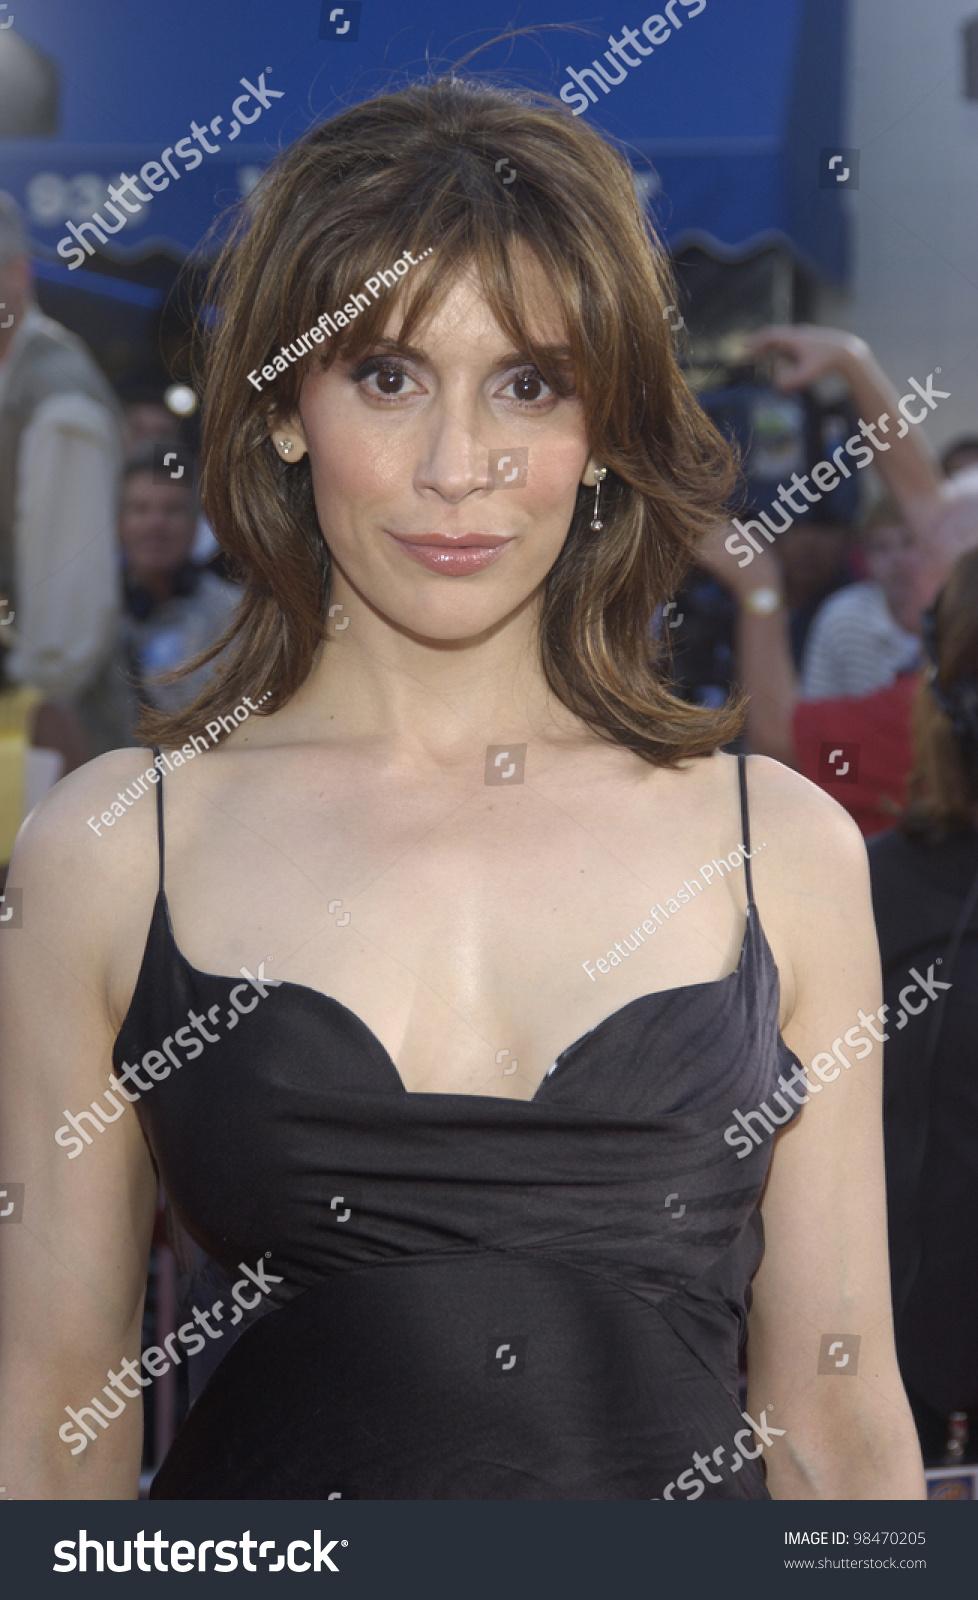 actress jo champa world premiere terminator stock photo (download